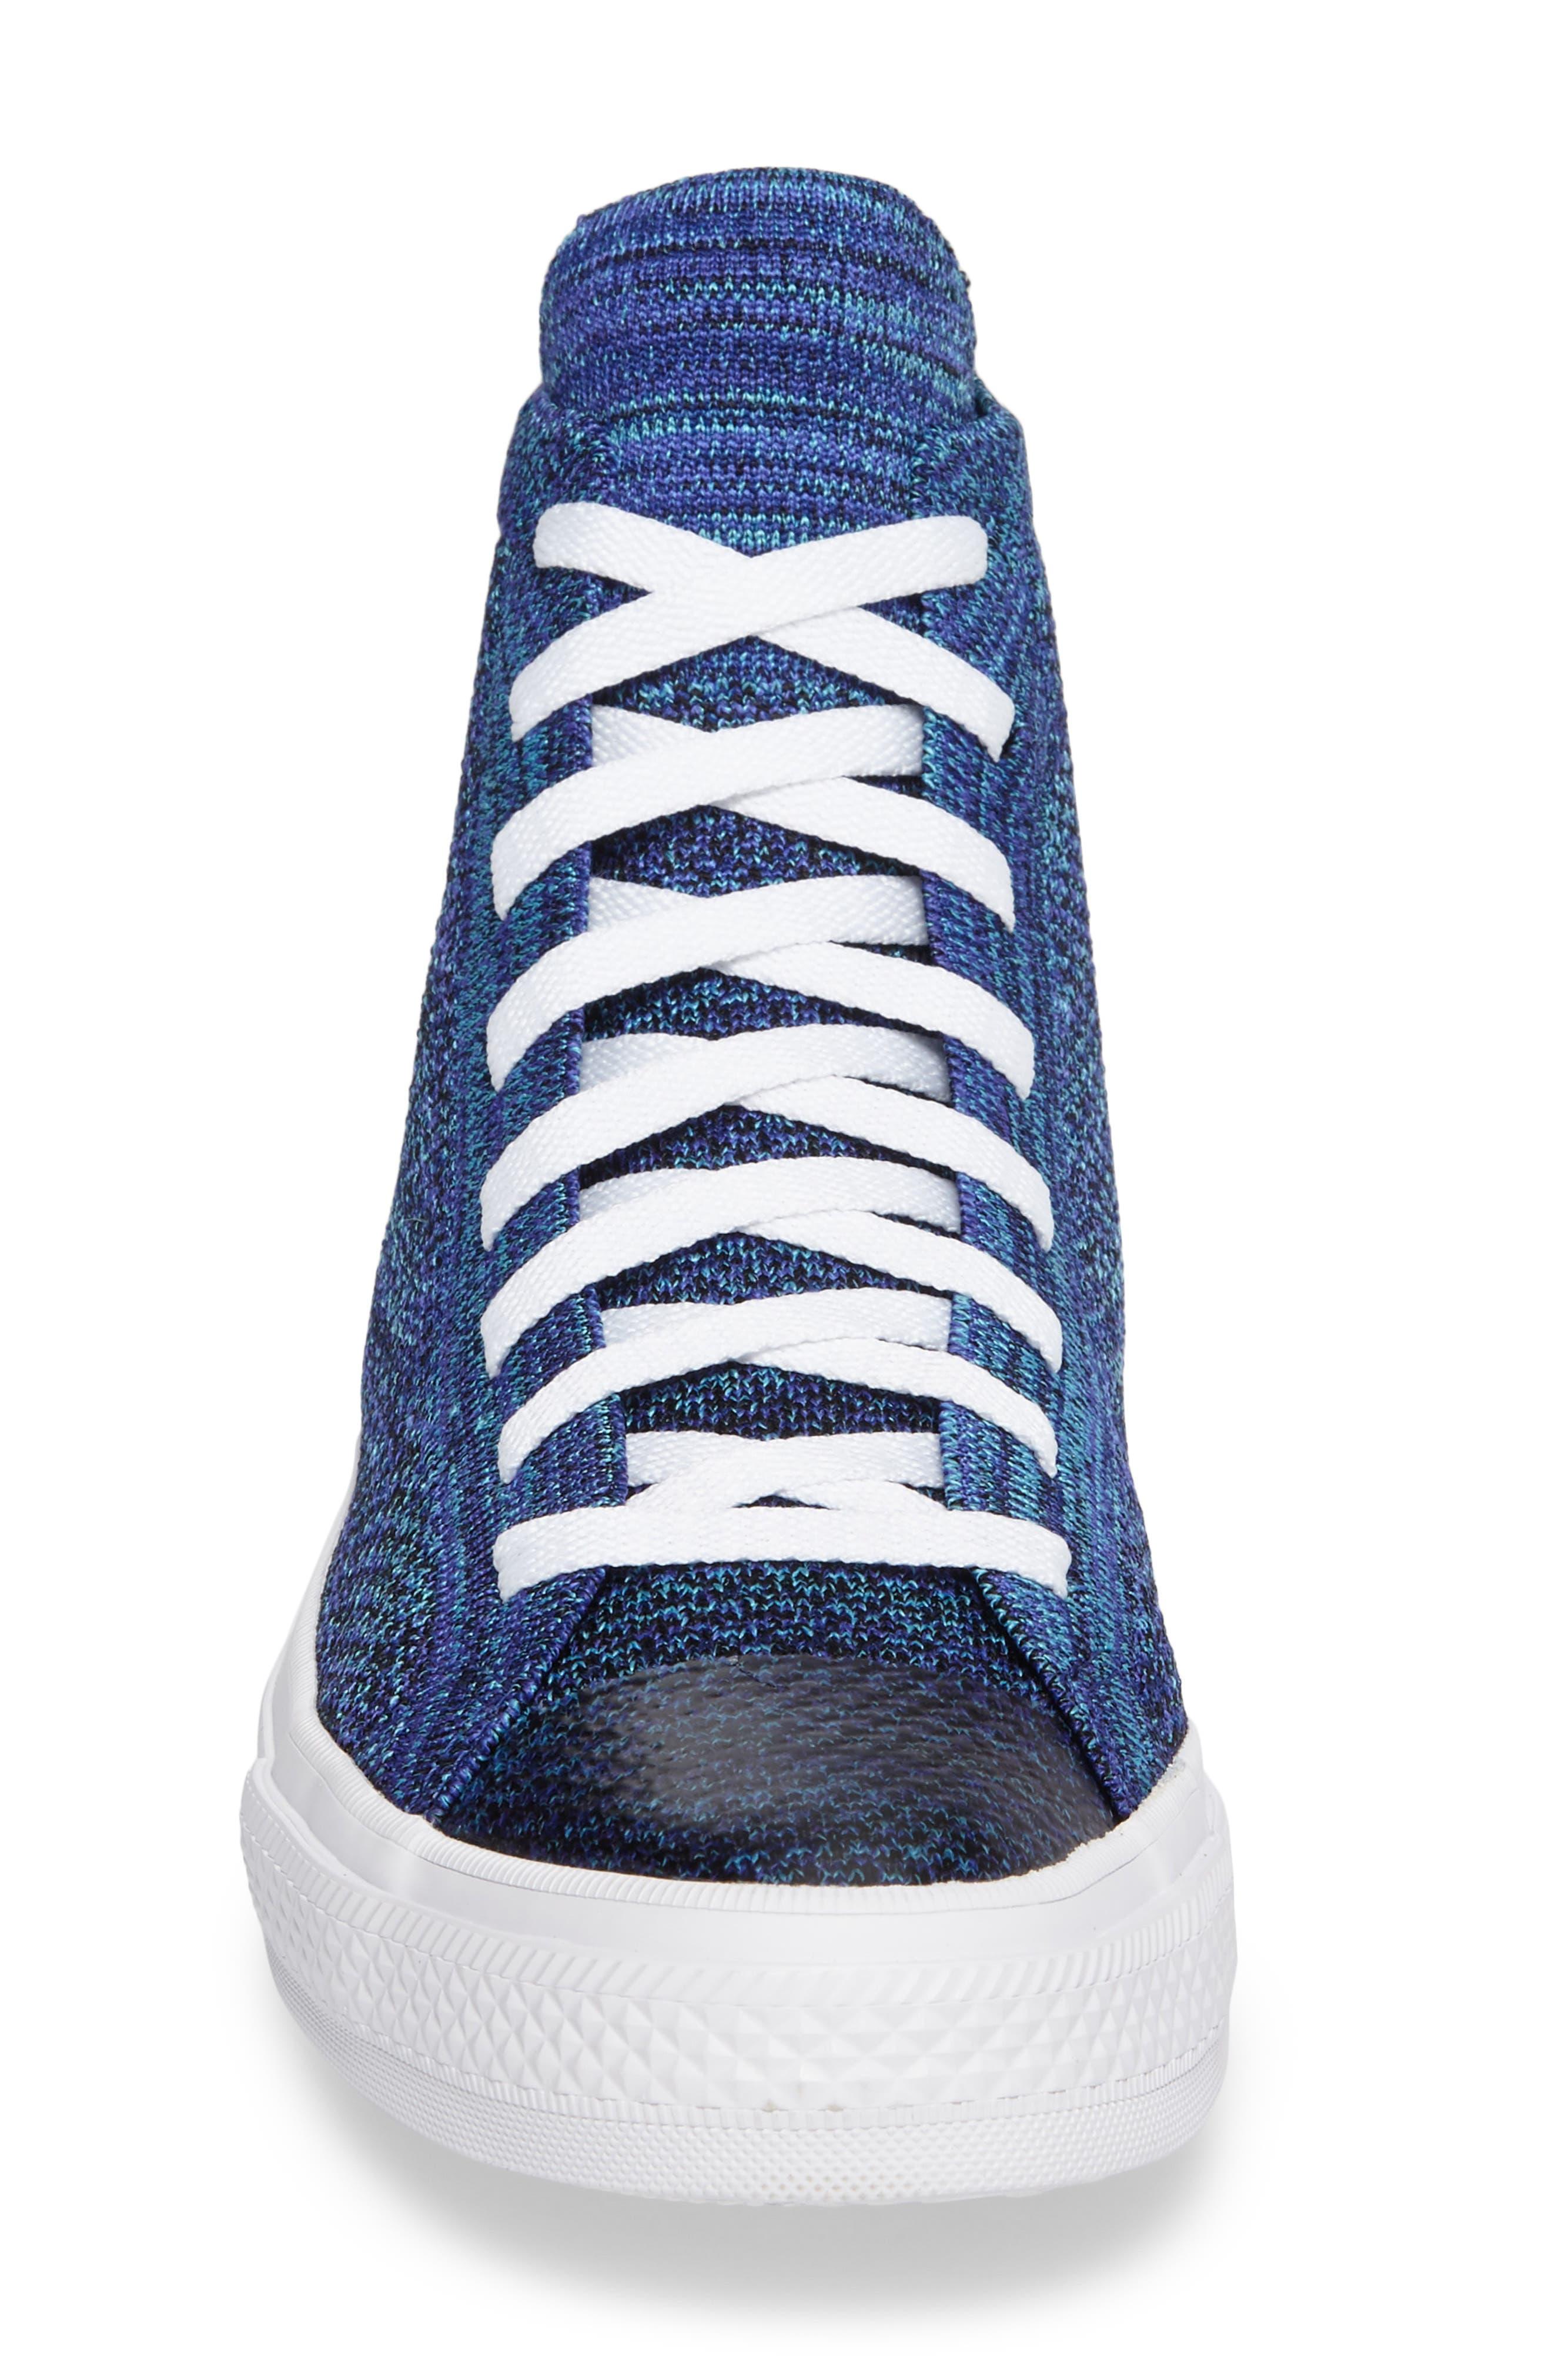 Chuck Taylor<sup>®</sup> All Star<sup>®</sup> Flyknit Hi Sneaker,                             Alternate thumbnail 4, color,                             Indigo